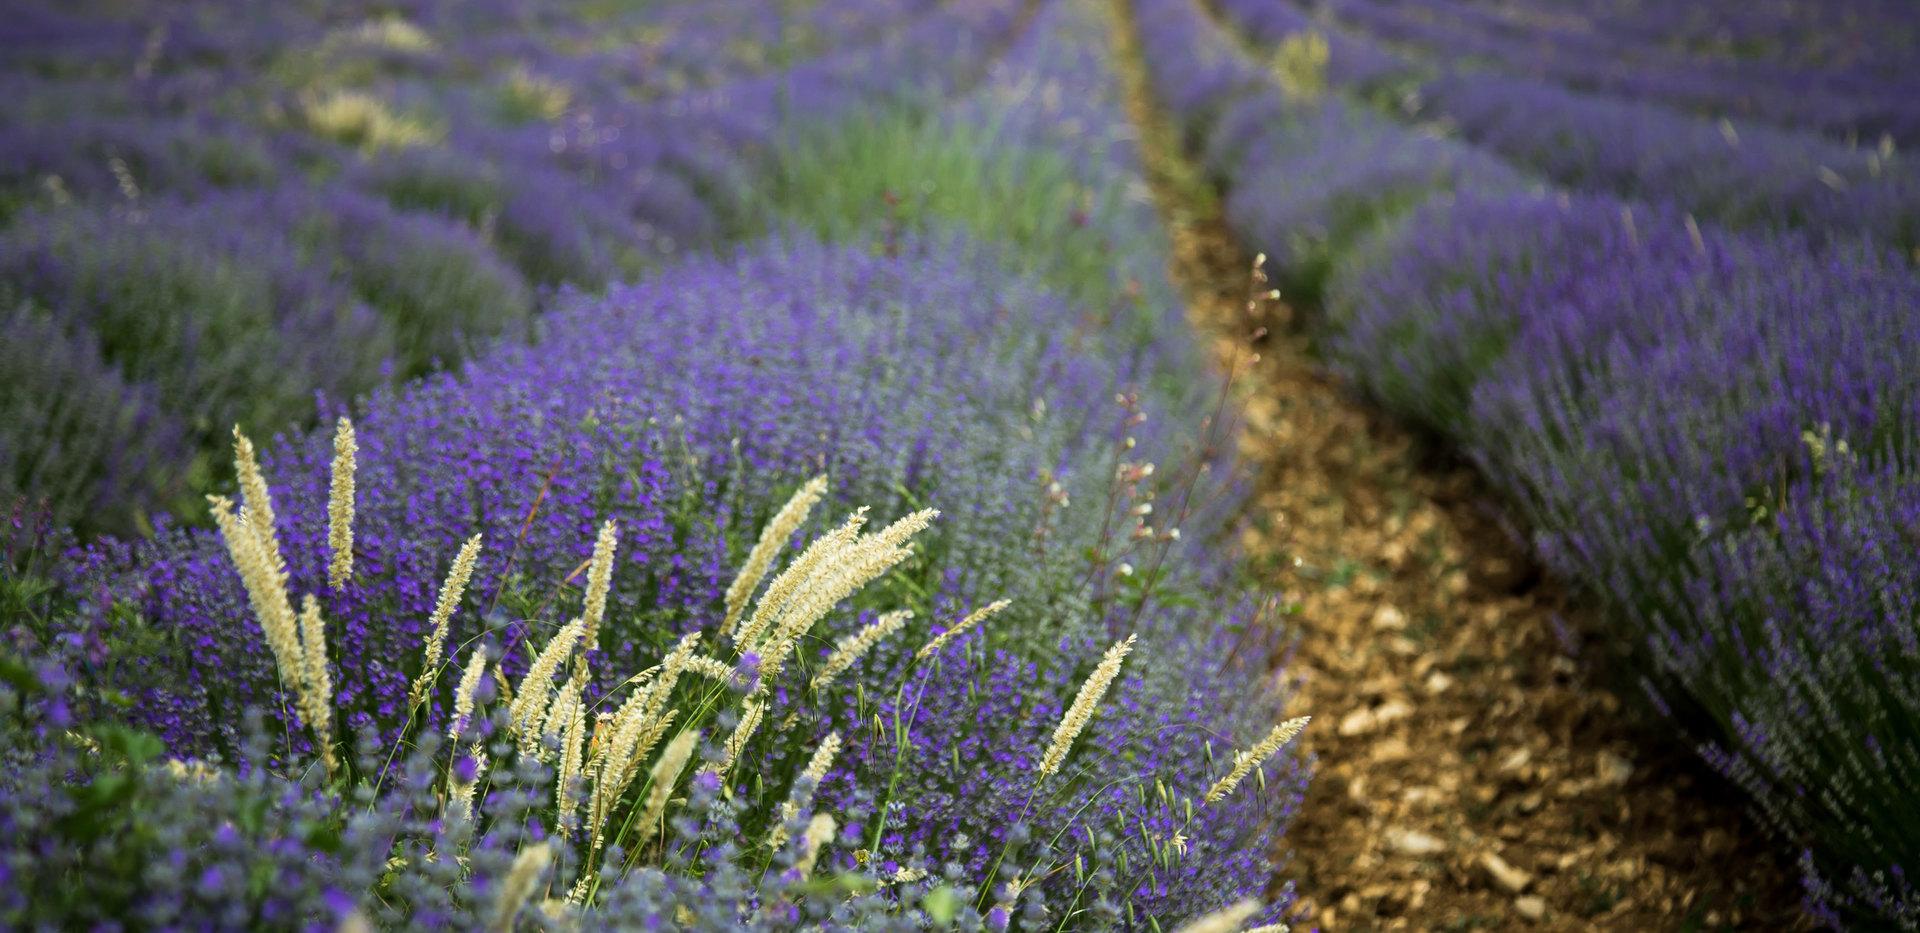 Farben der Provence | Lavendel | fototouren.net